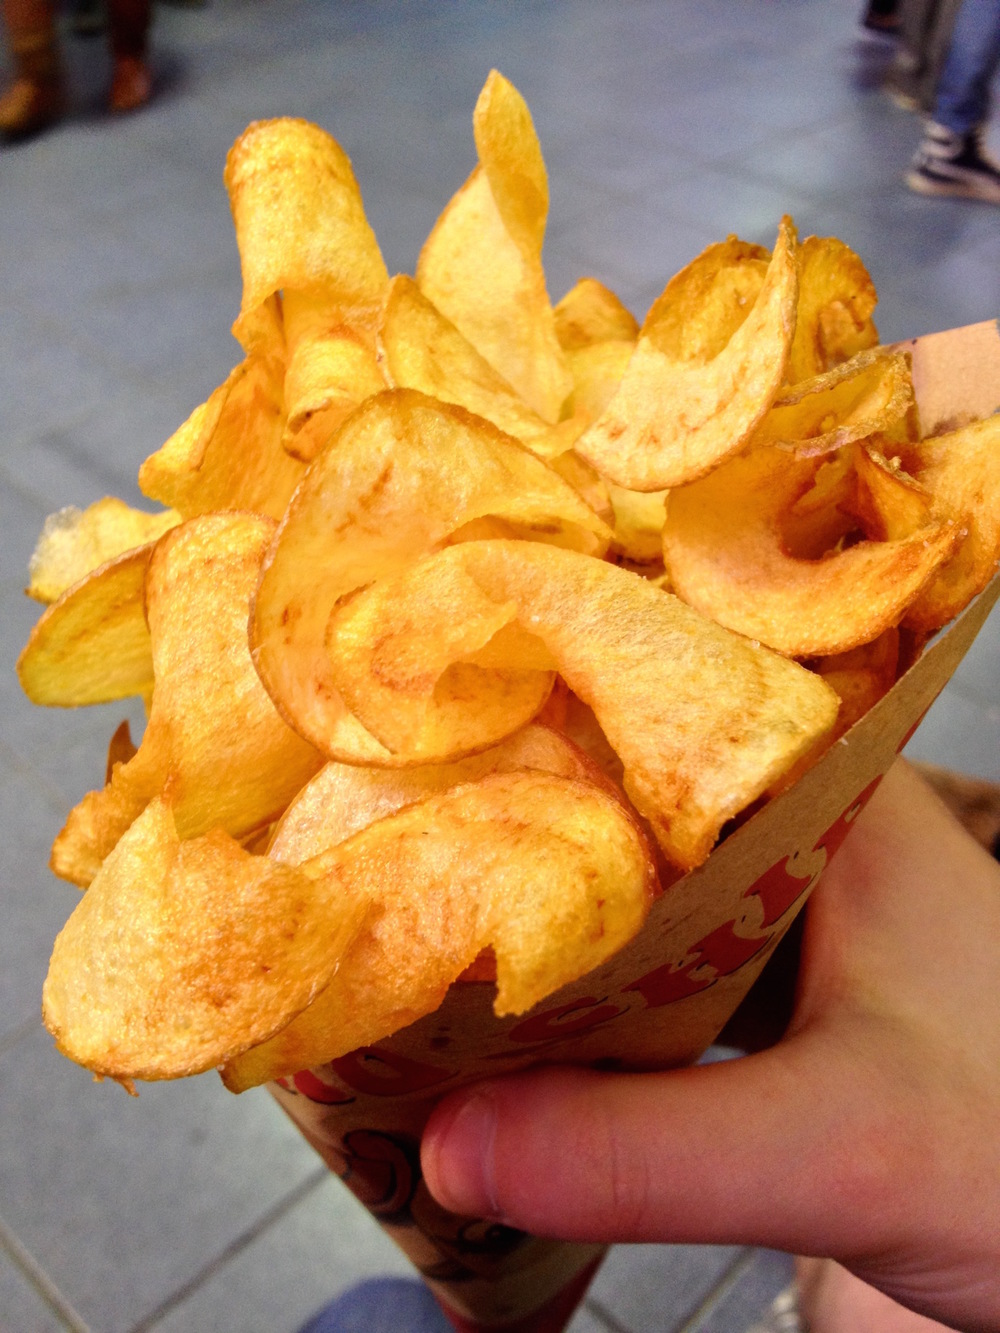 Fresh fried potato chips